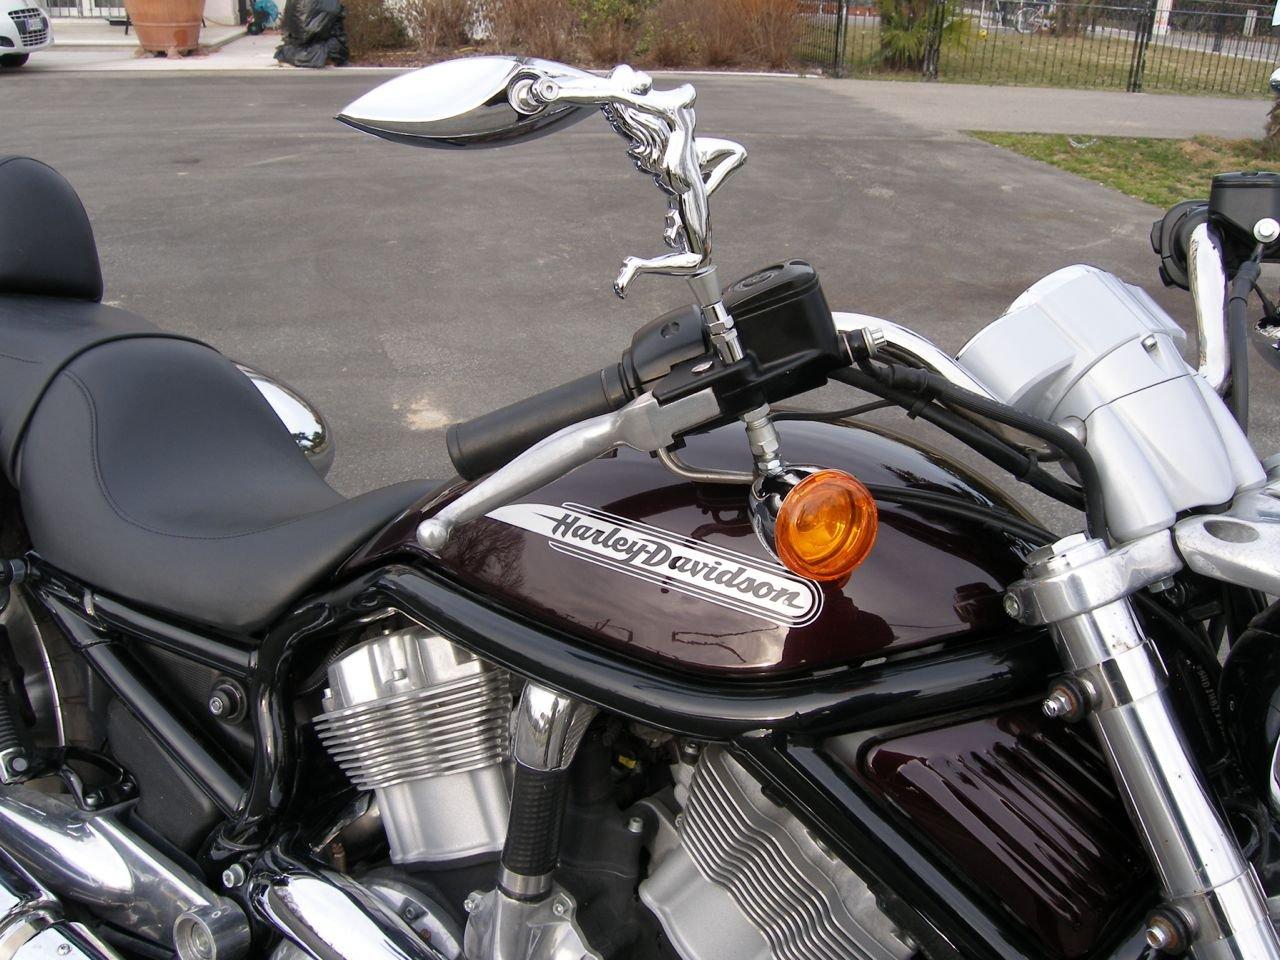 Harley Davidson Mirror Adapters for Metric Mirrors 795-pair